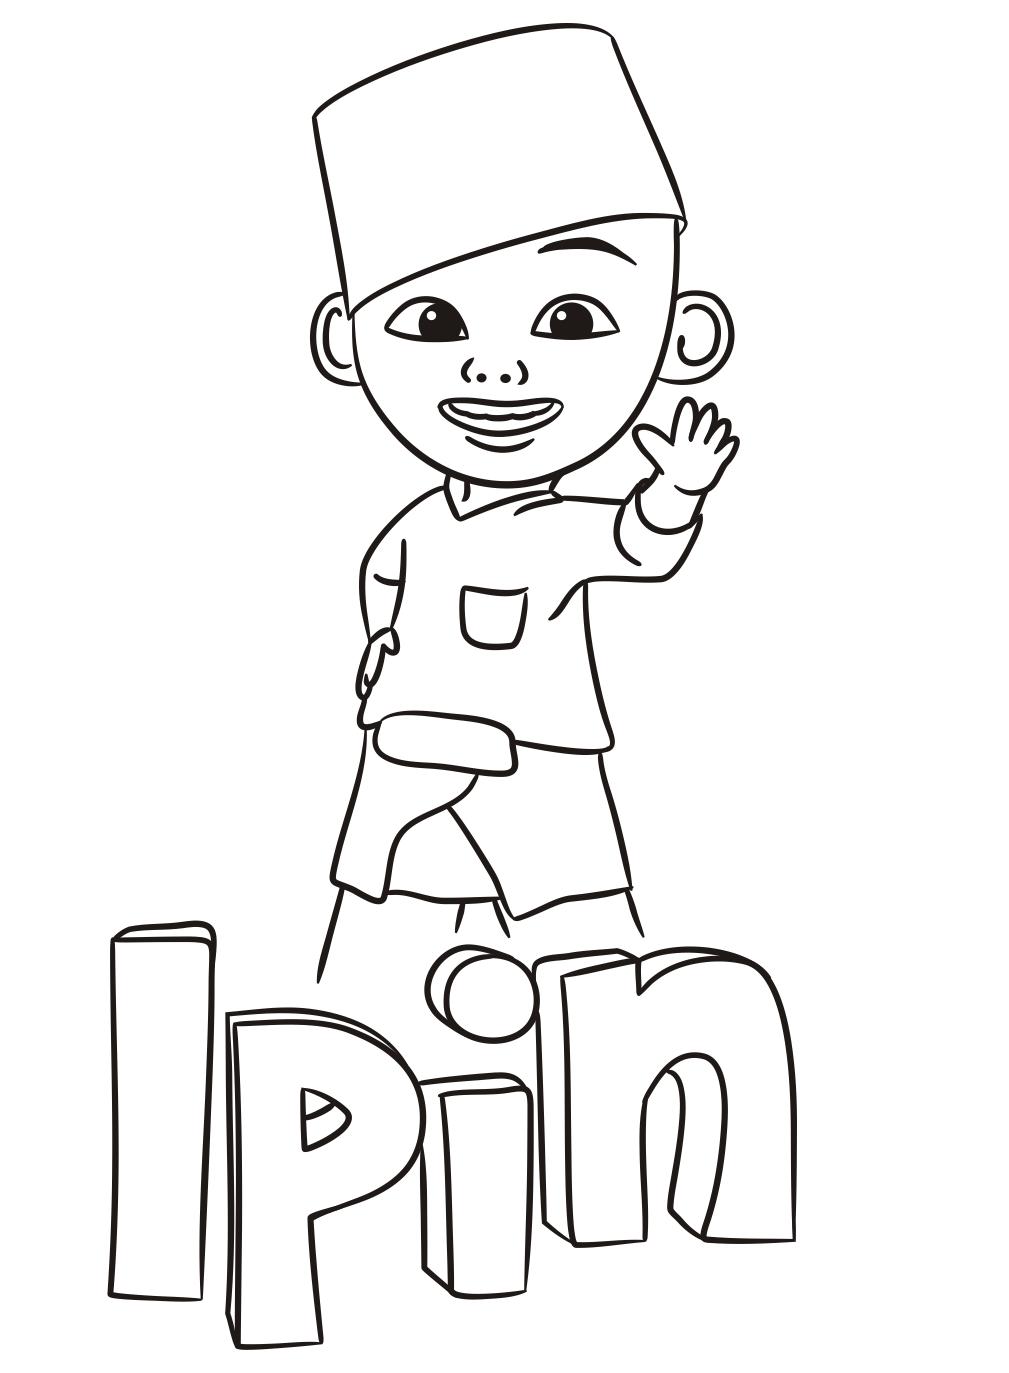 Gambar Kartun Upin Ipin Untuk Mewarnai • BELAJARMEWARNAI.info